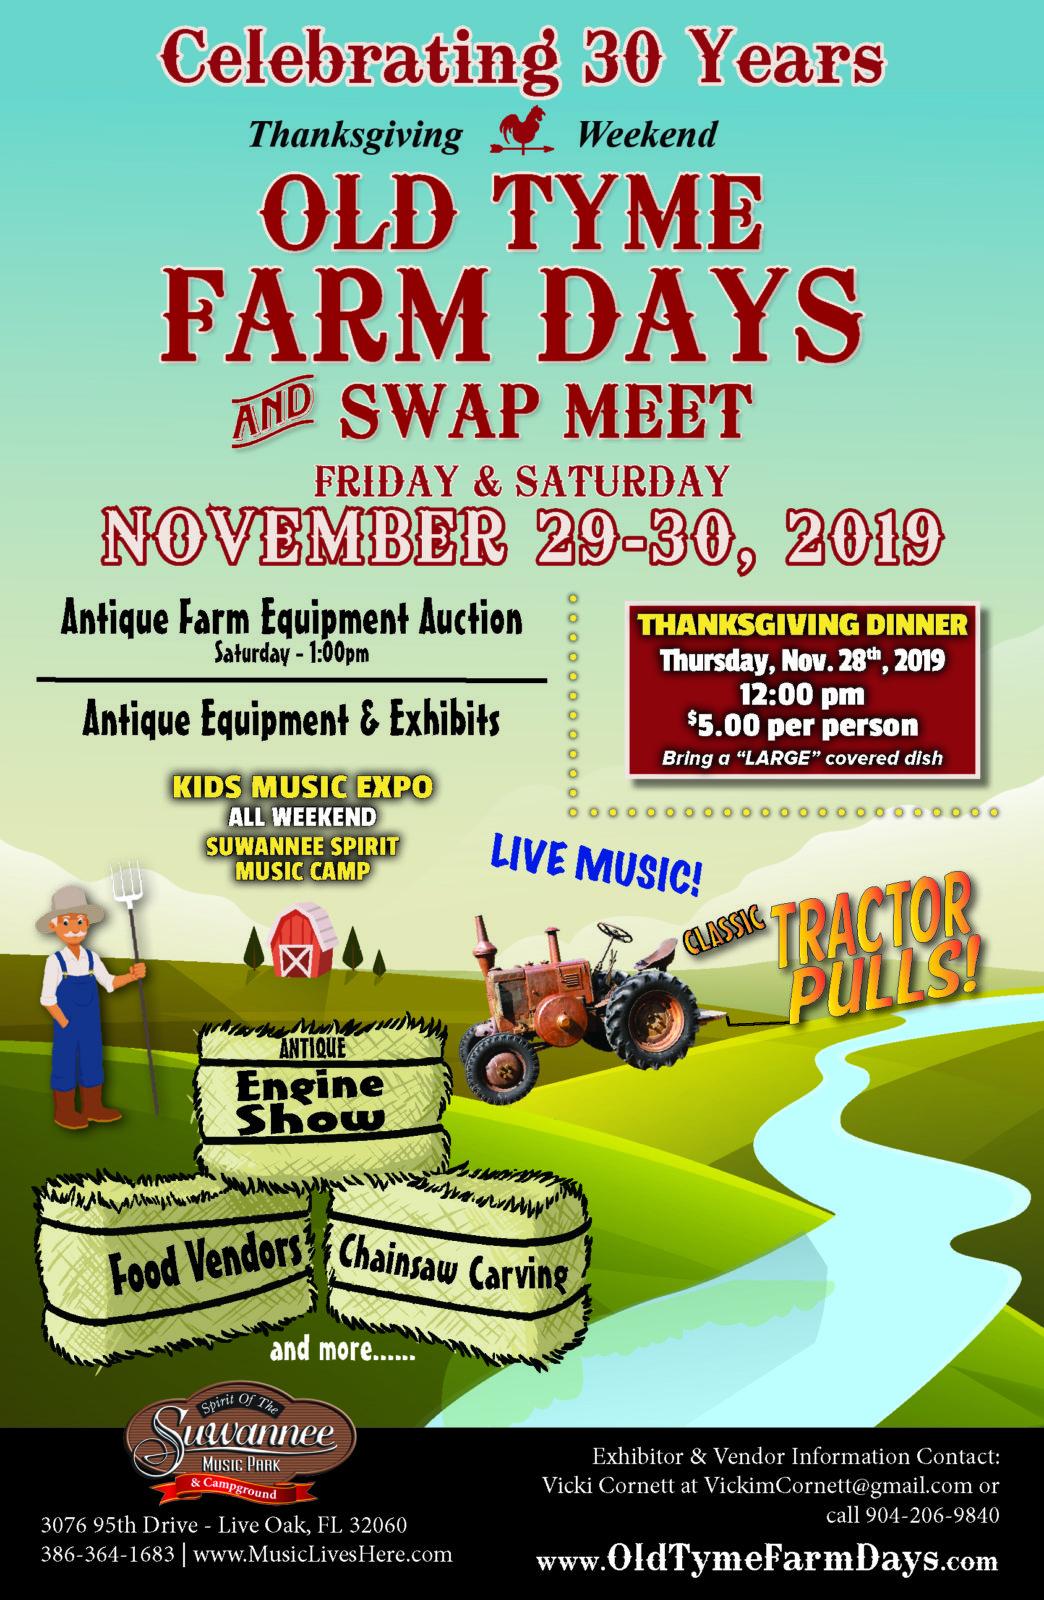 Old Tyme Farm Days & Swap Meet